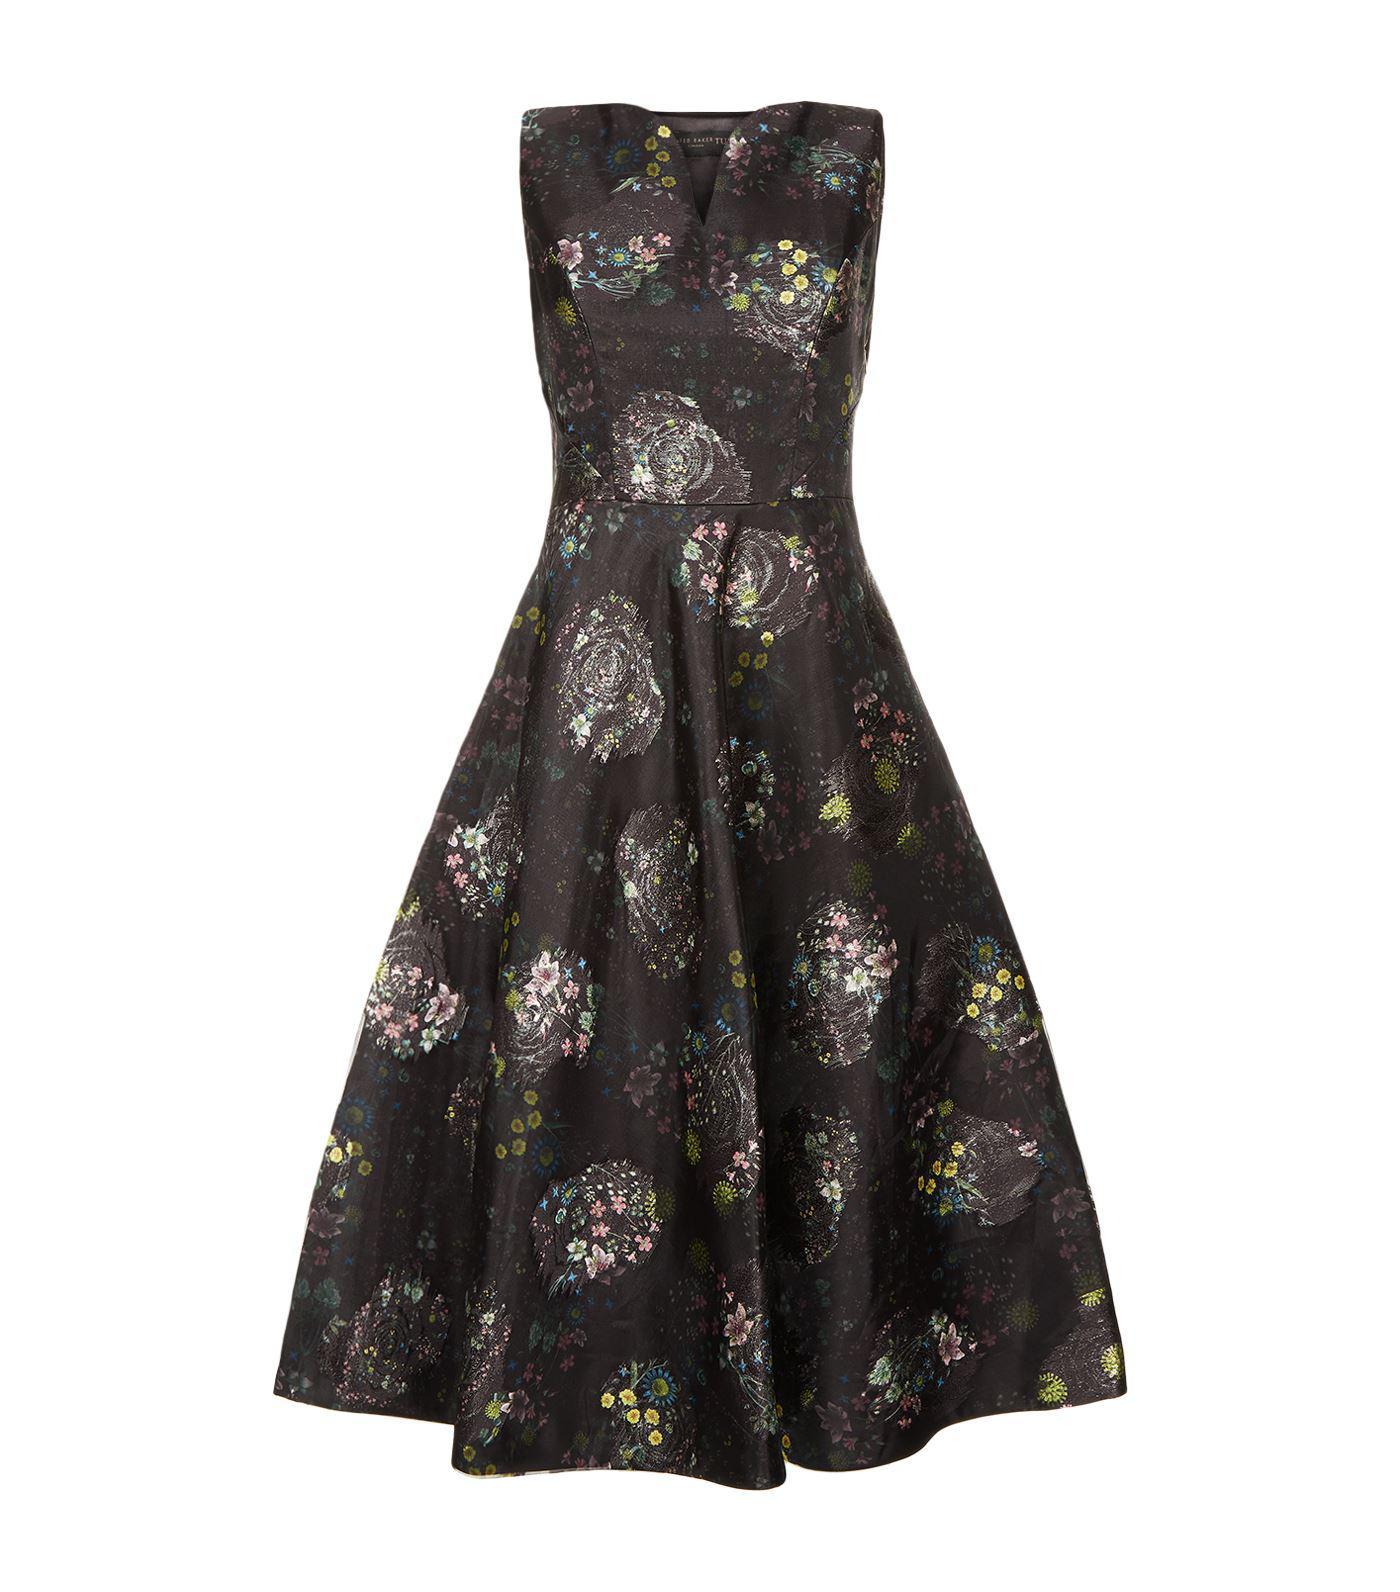 d0cff09edb39 Lyst - Ted Baker Rebetta Paisley Floral Midi Dress in Black